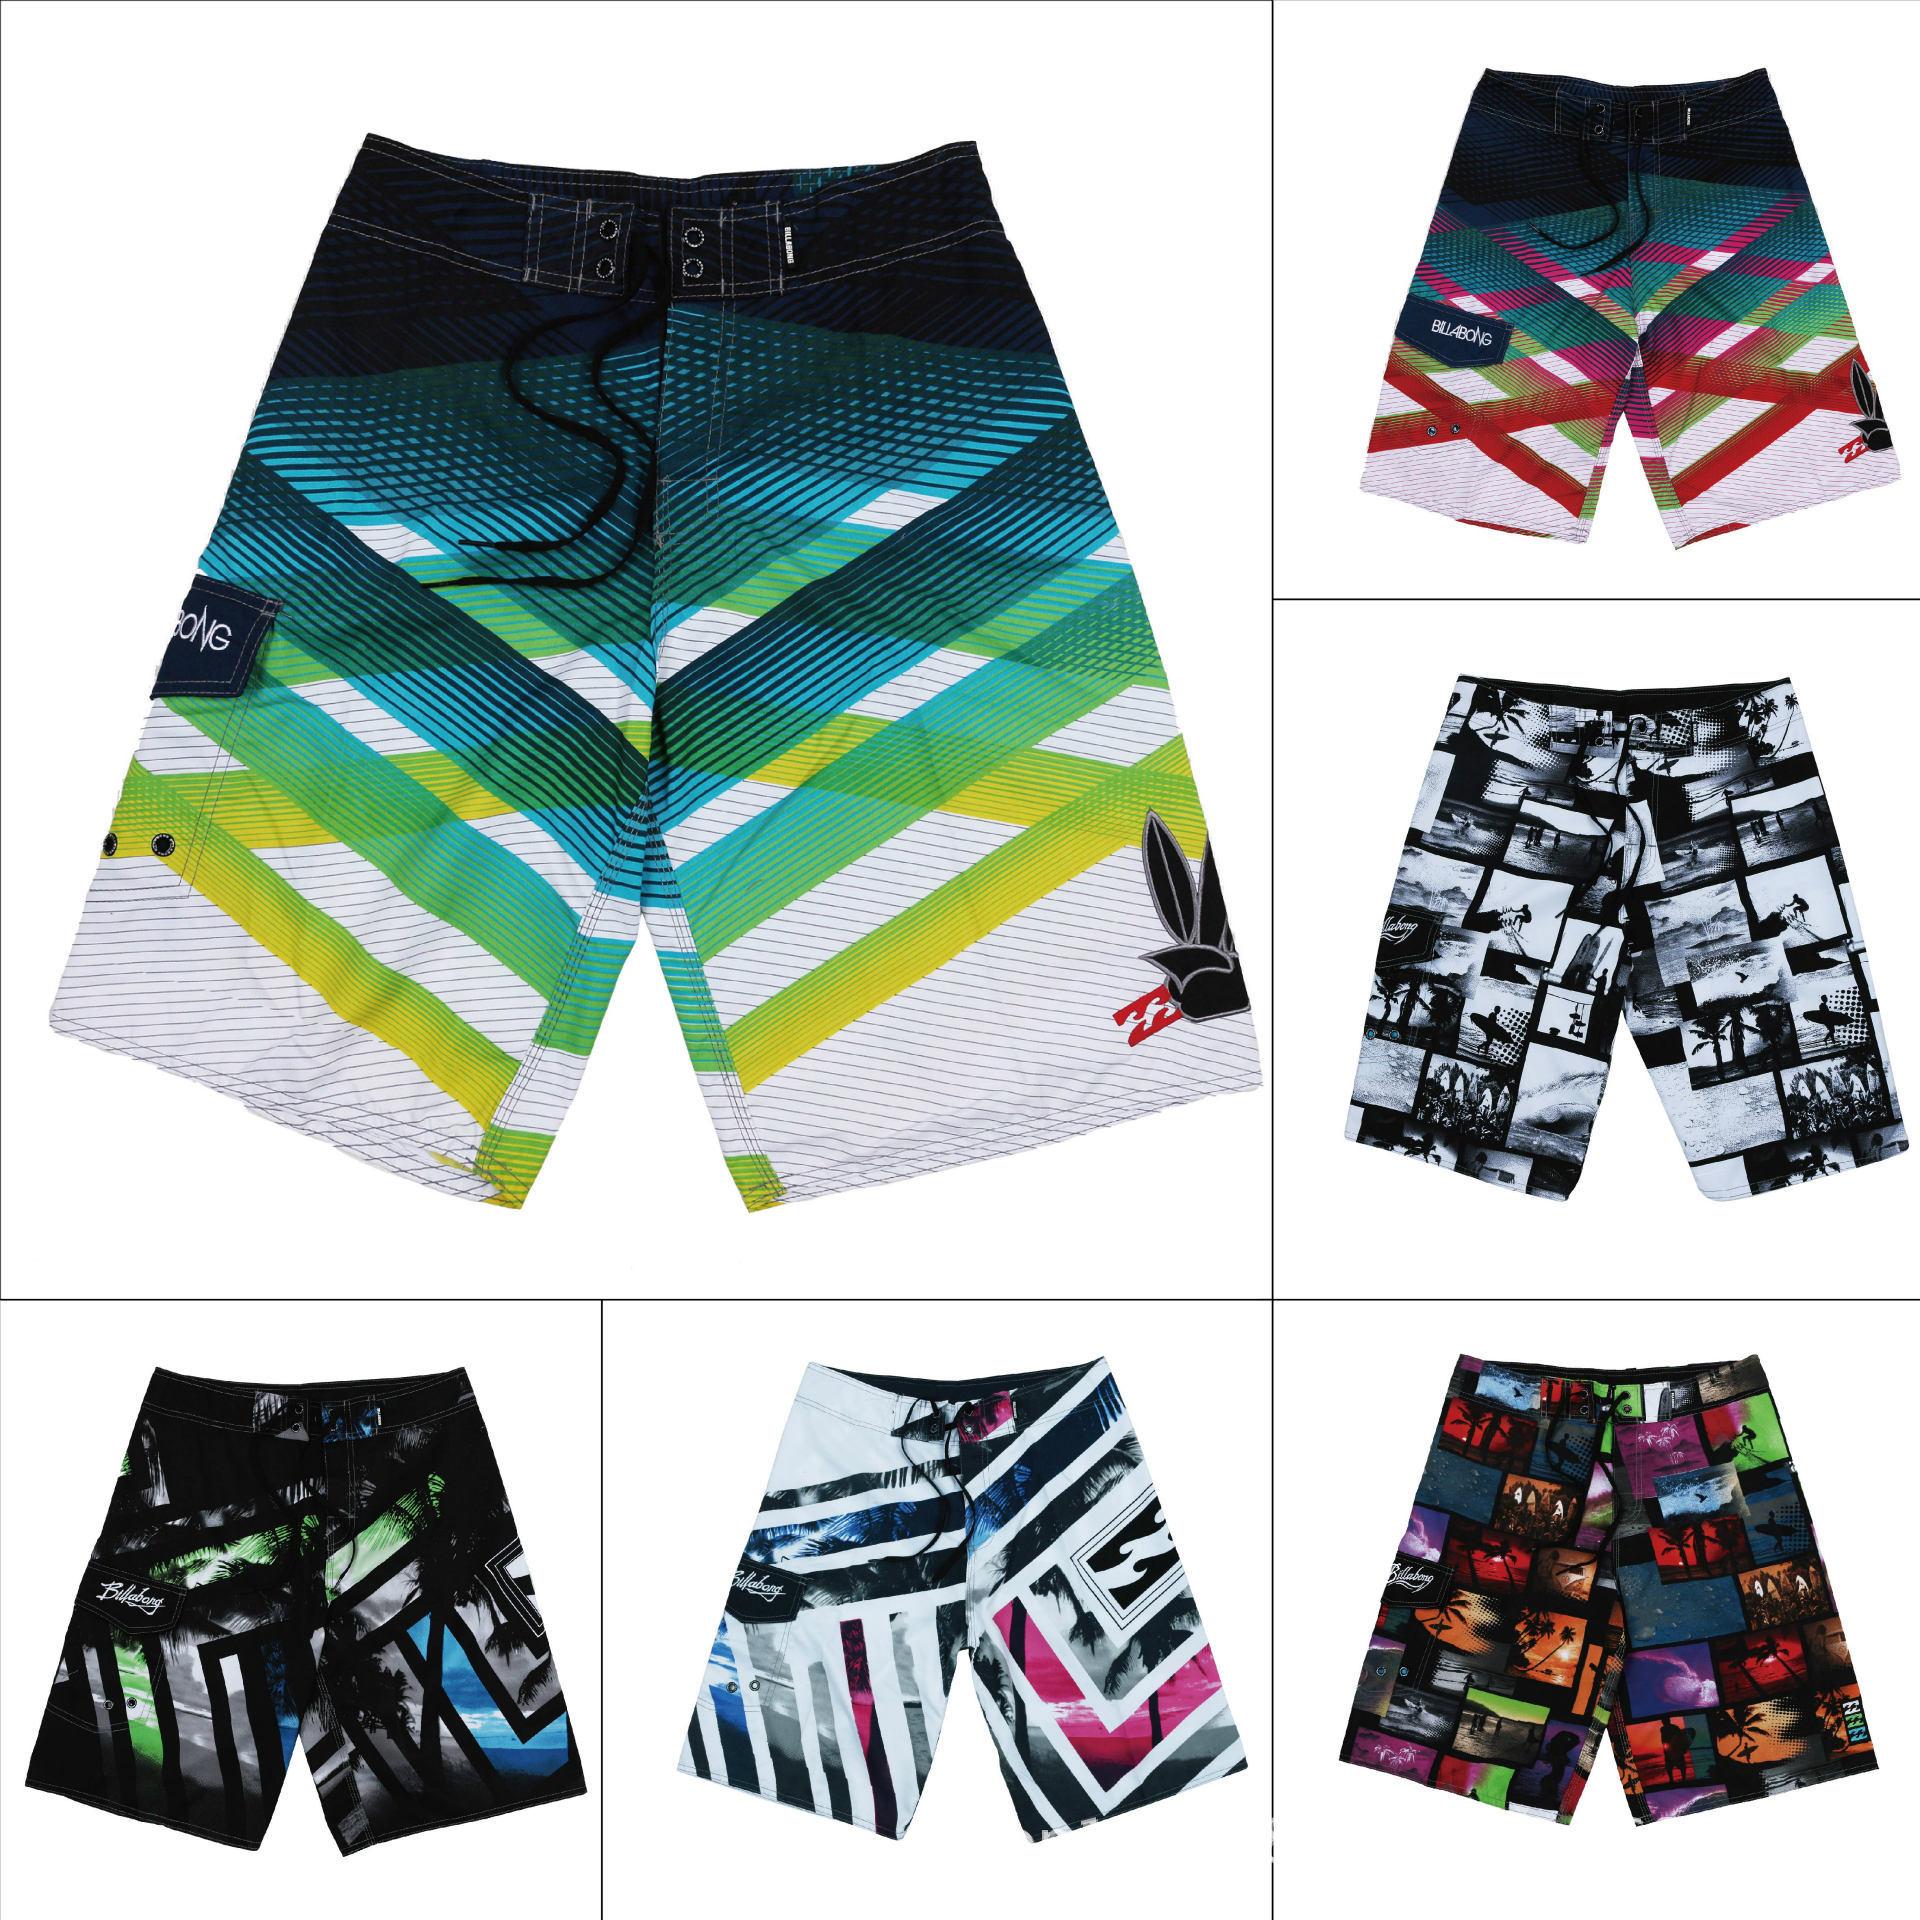 Whosale Price /More Styles / 2015 new Brand Billabong men's brand short bermuda boardshorts outdoor sports surf beach shorts(China (Mainland))